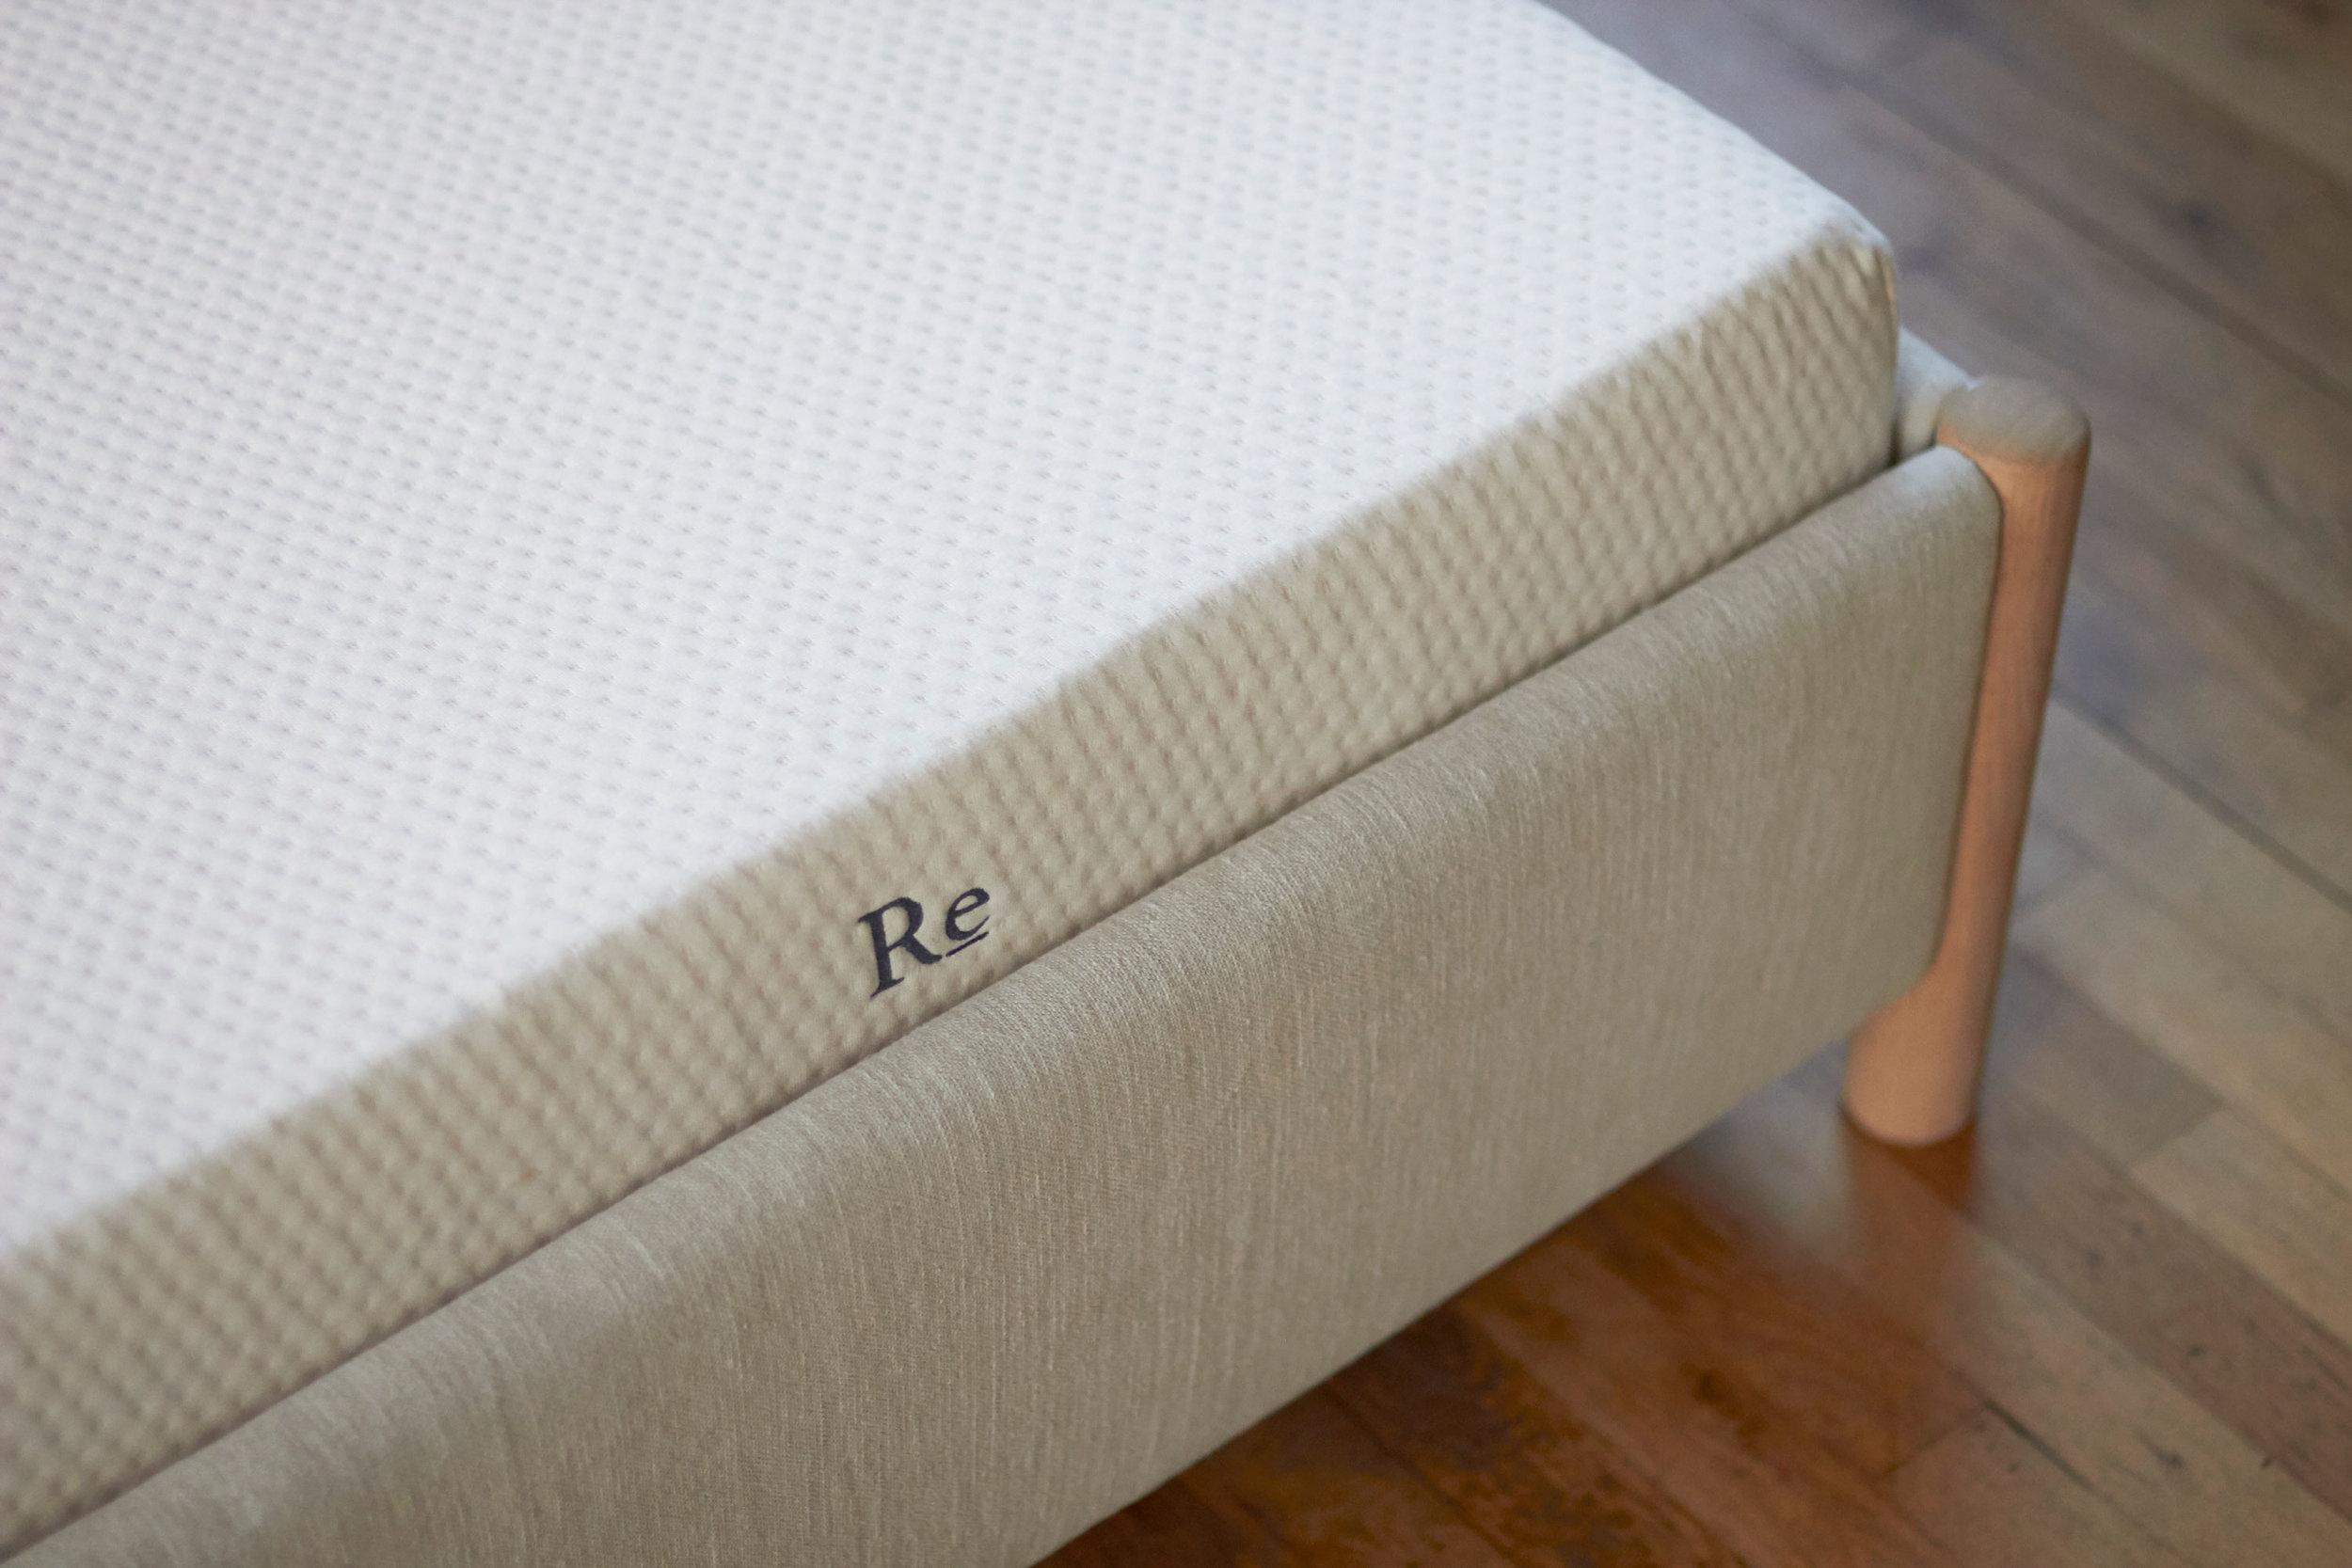 re-veng-bed-detail-14.jpg